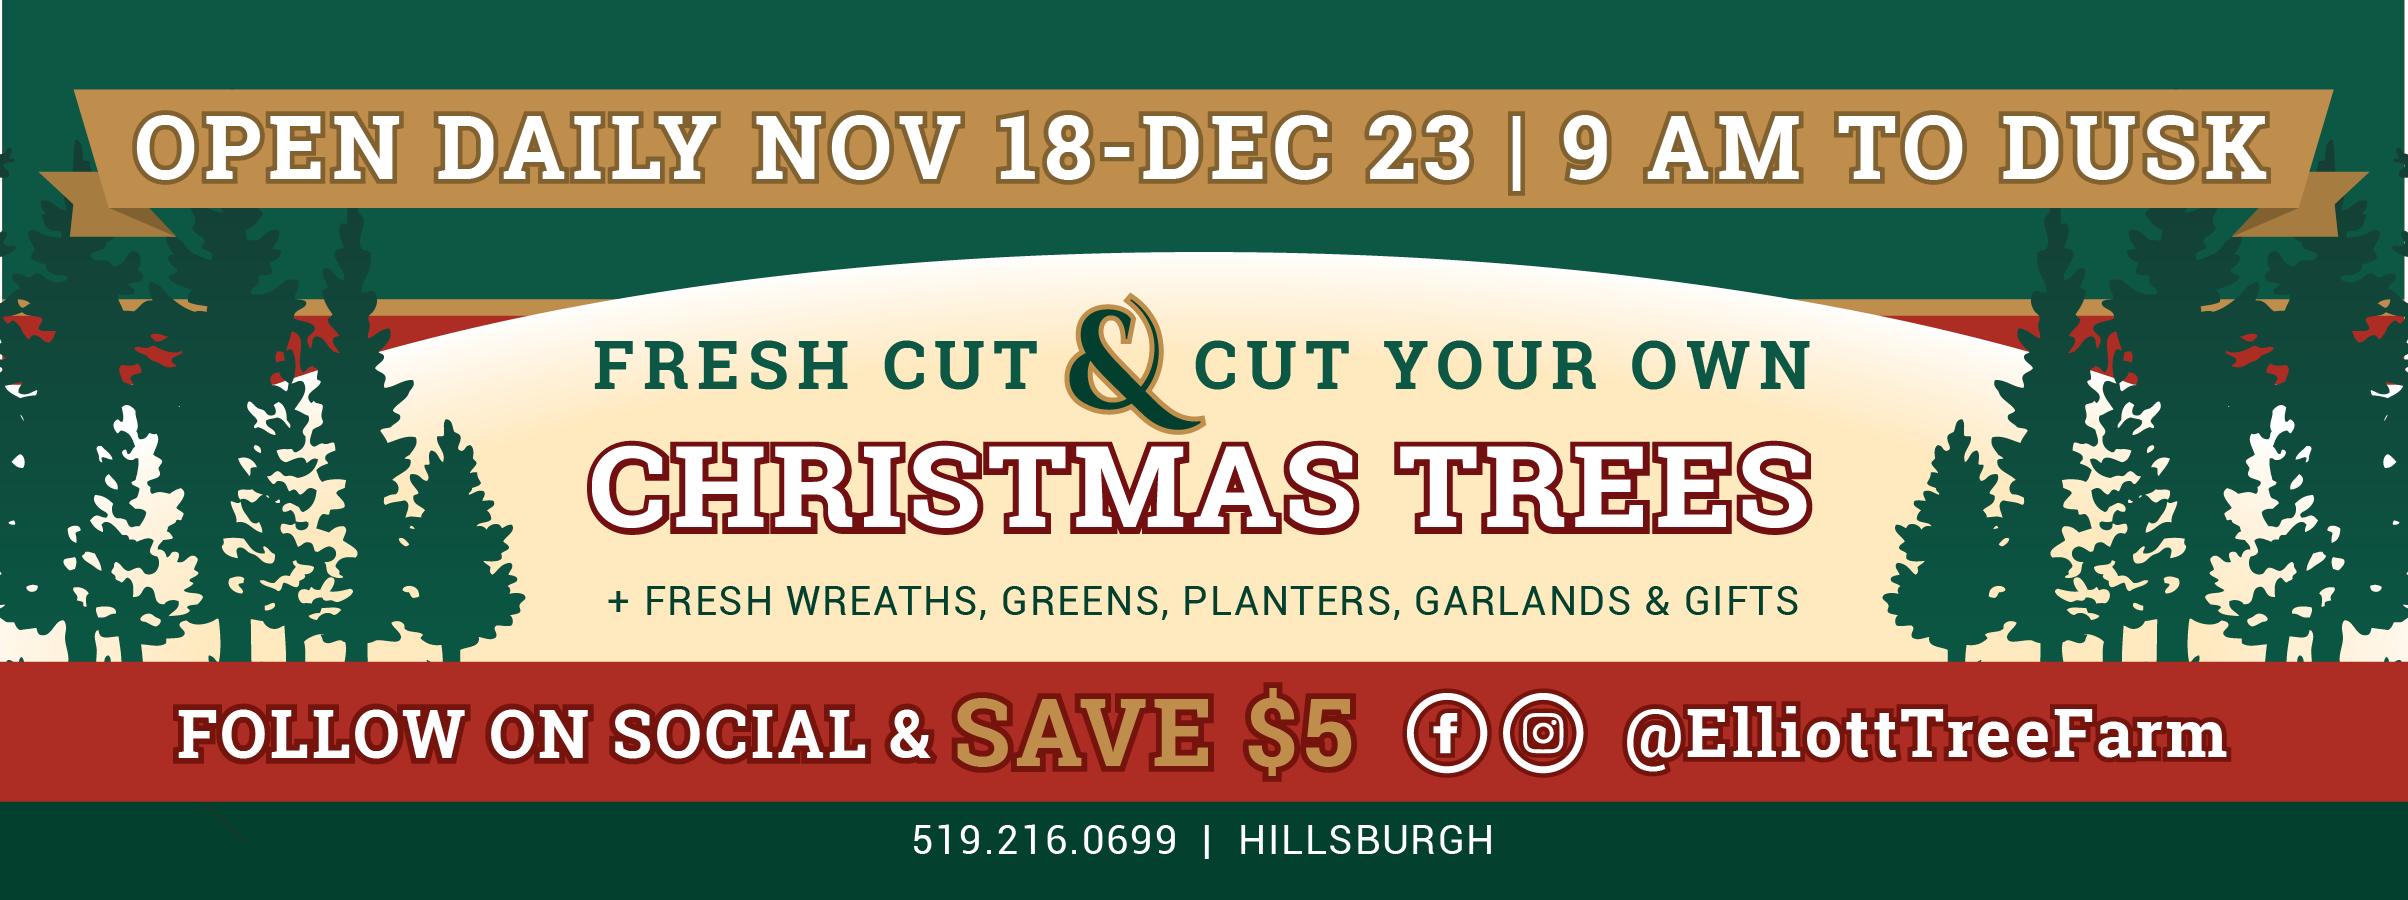 Christmas Trees near Toronto. Open November 17 to 23